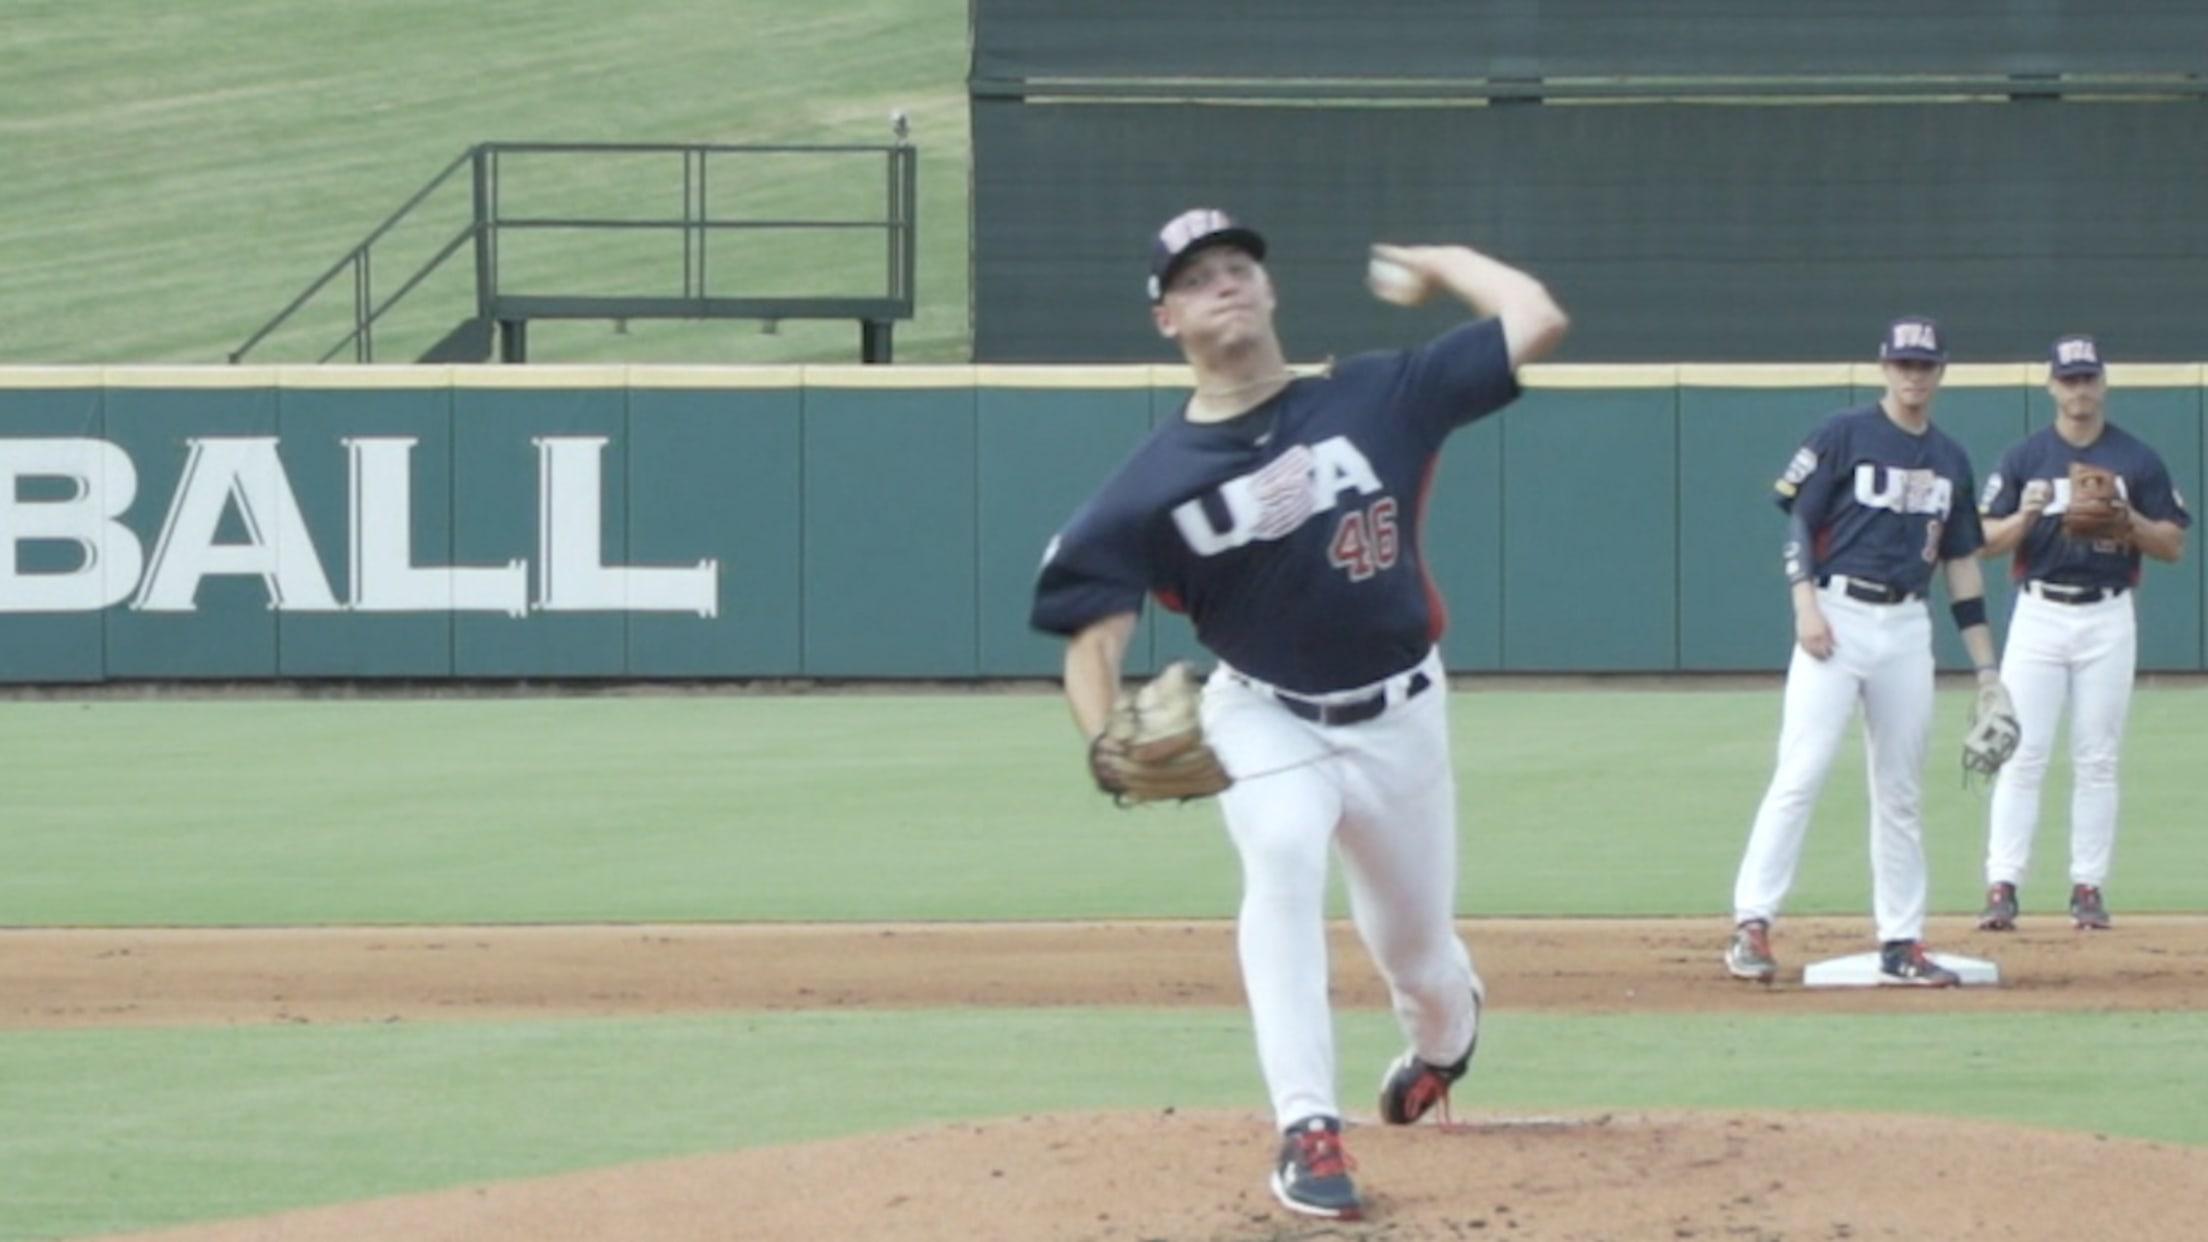 Top Prospects: Reid Detmers